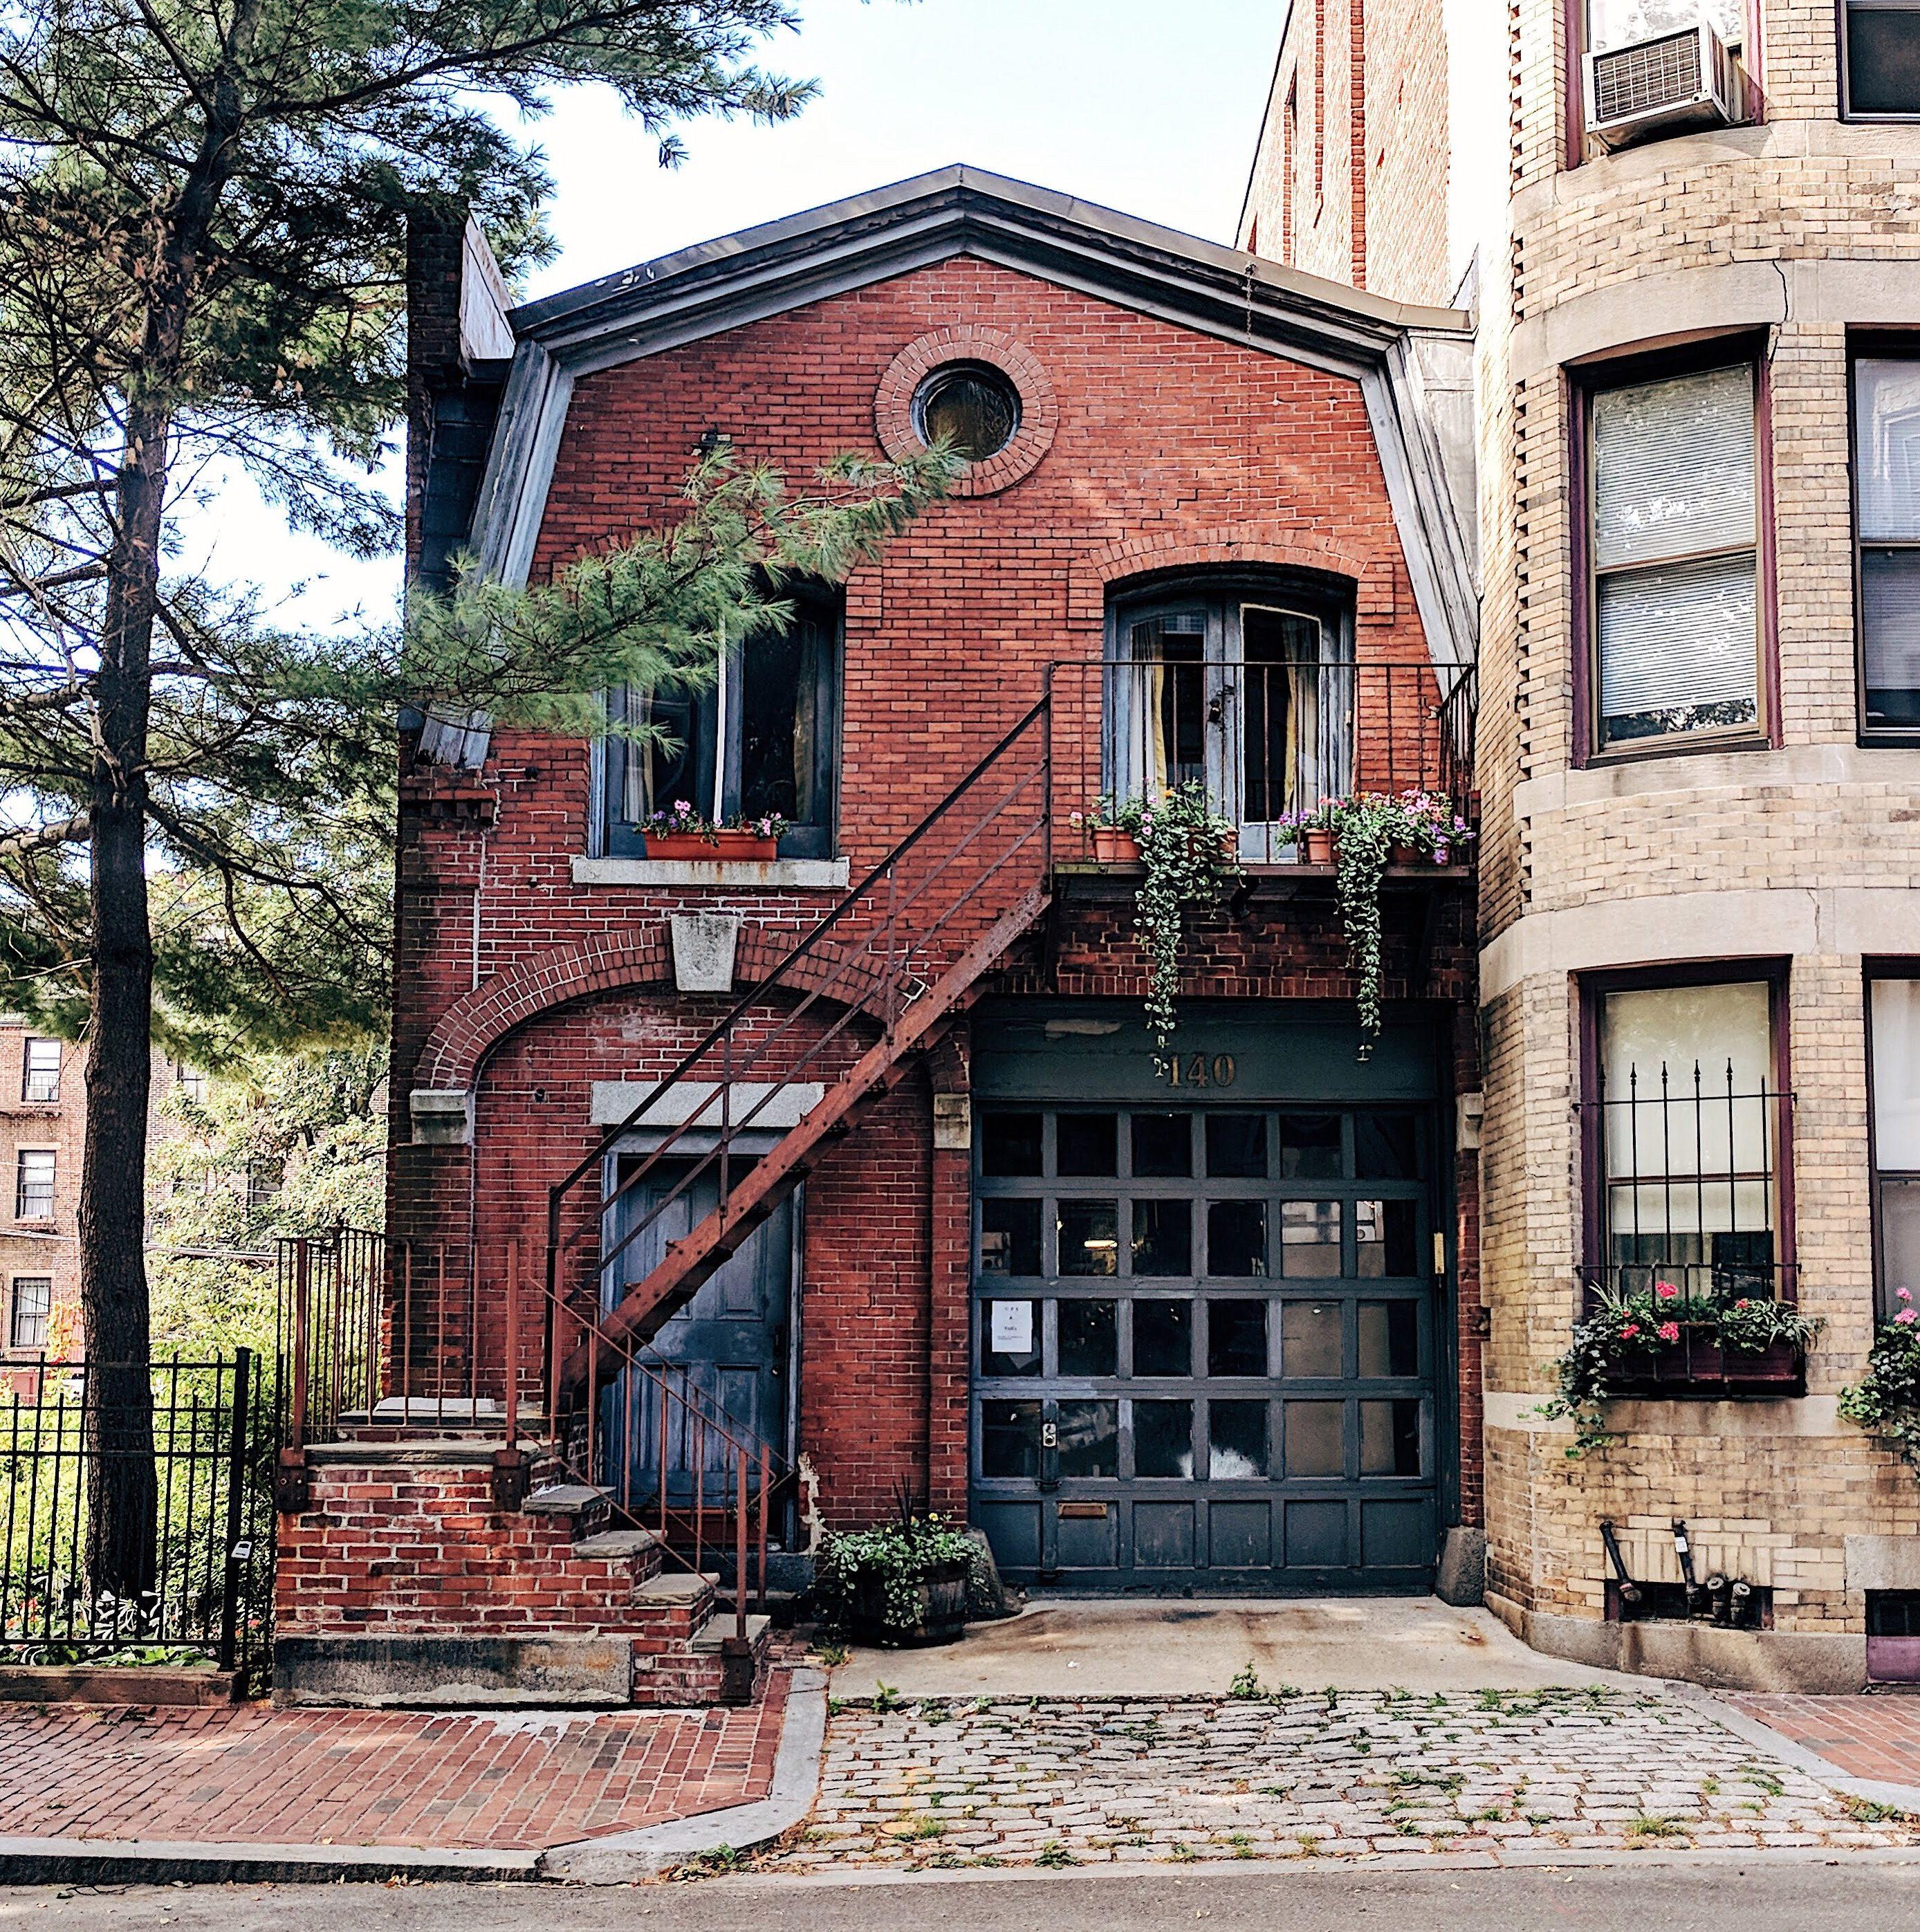 ICYMI: My ultimate Boston staycation on Boston.com